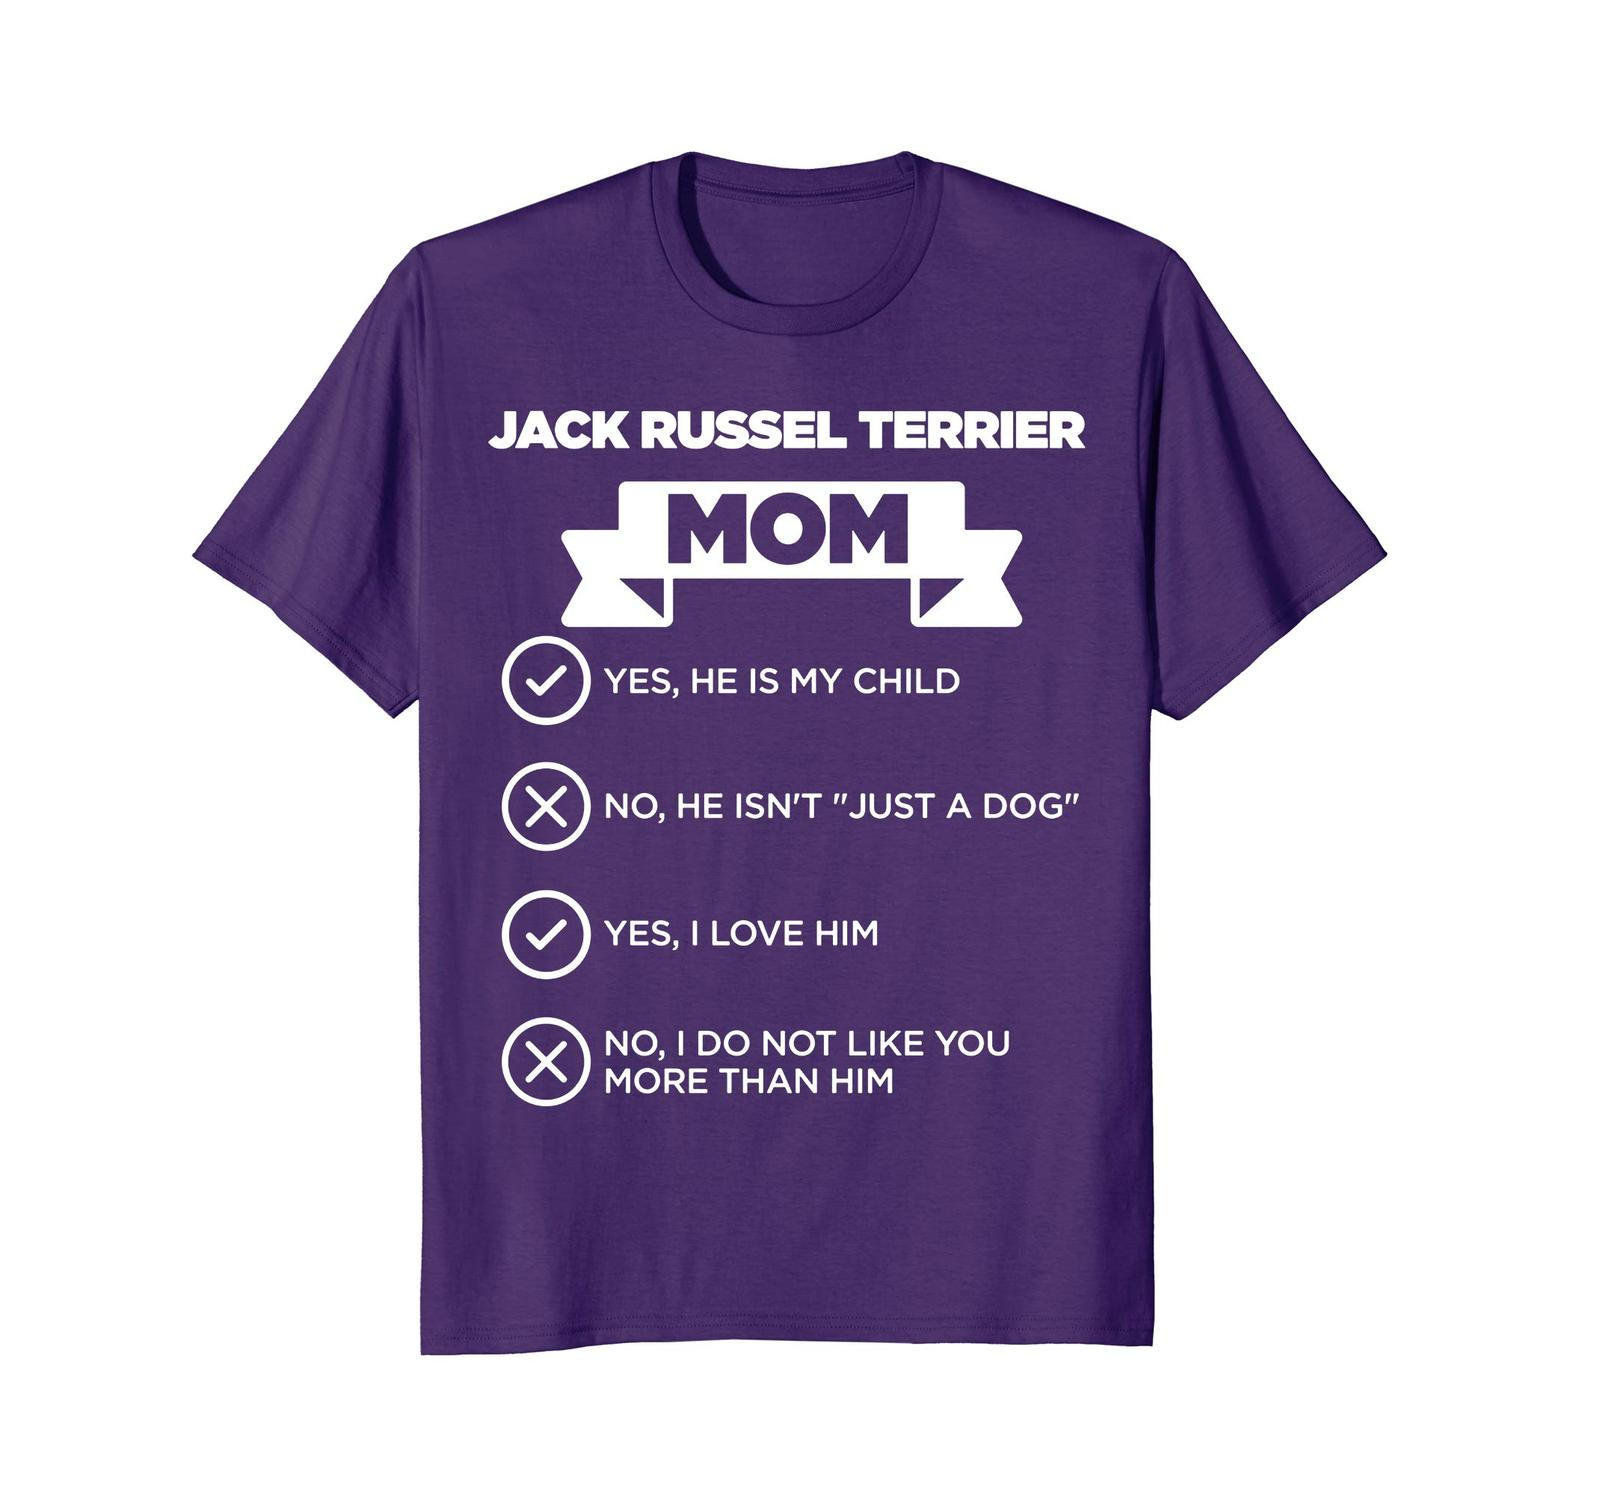 Dog Fashion - Jack Russel Terrier Mom Checklist Funny Dog Lover T-Shirt Men